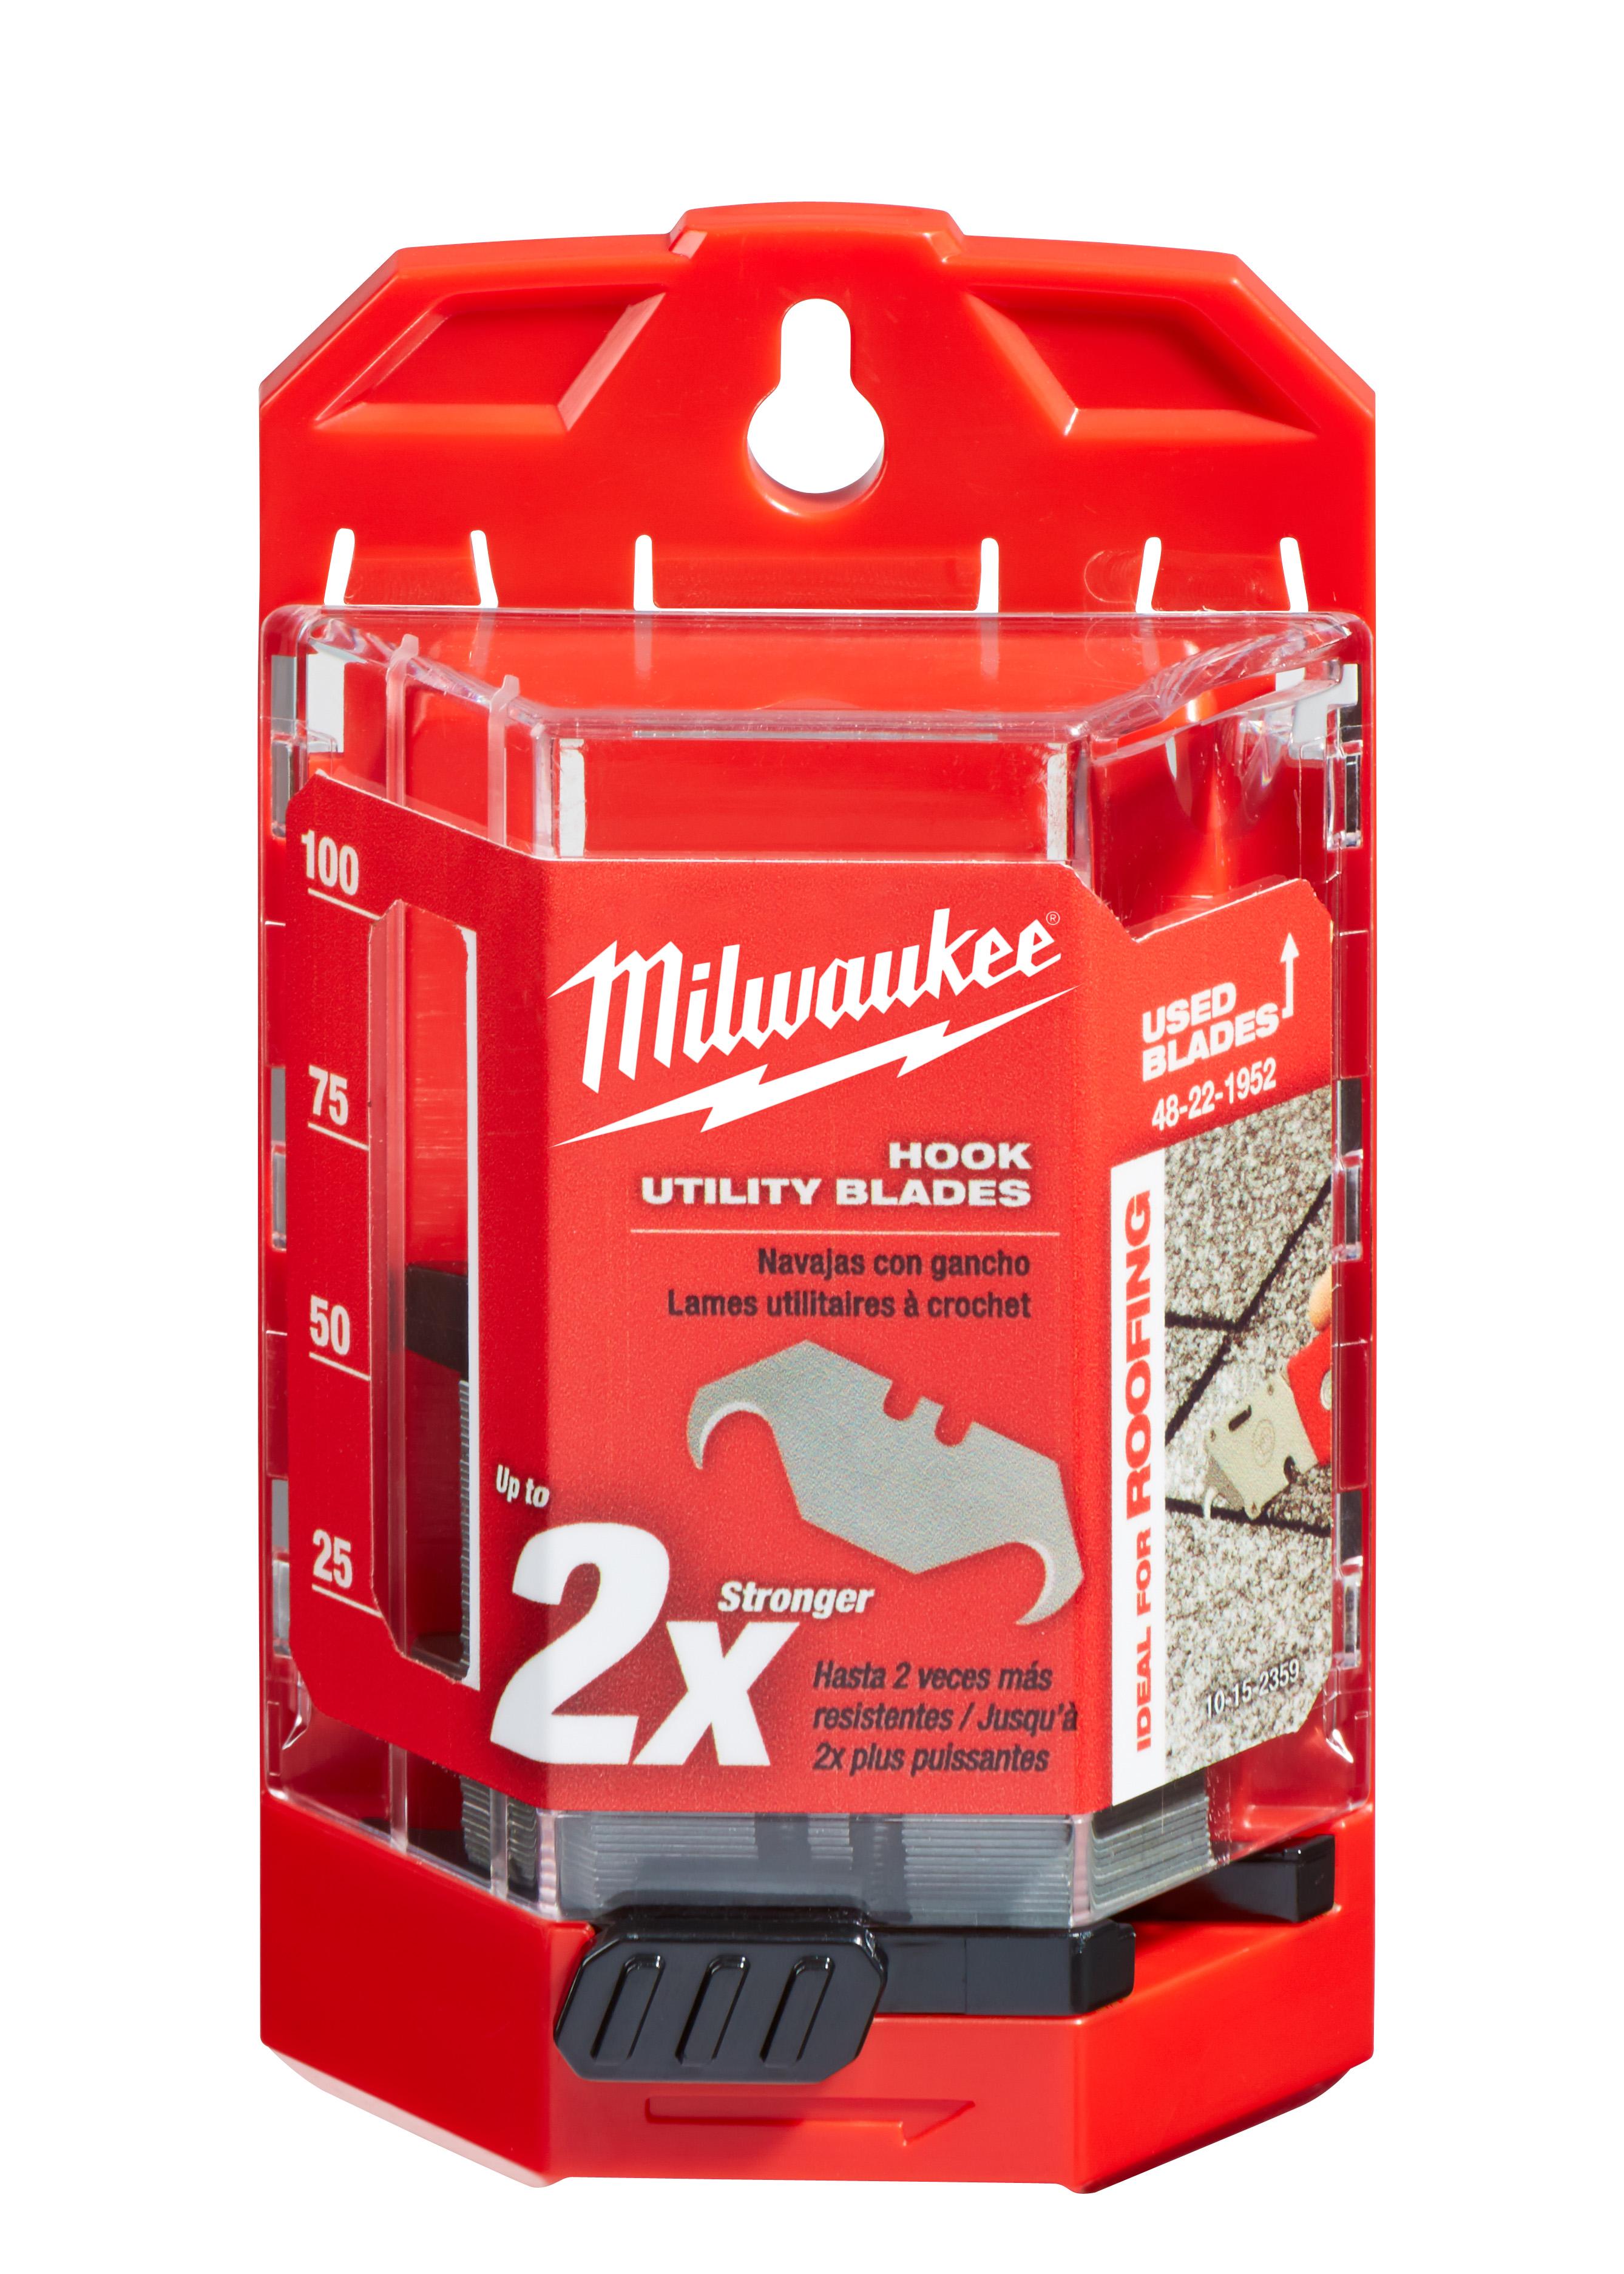 Milwaukee 48-22-1952 50-Piece Hook Utility Knife Blades w/ Dispenser